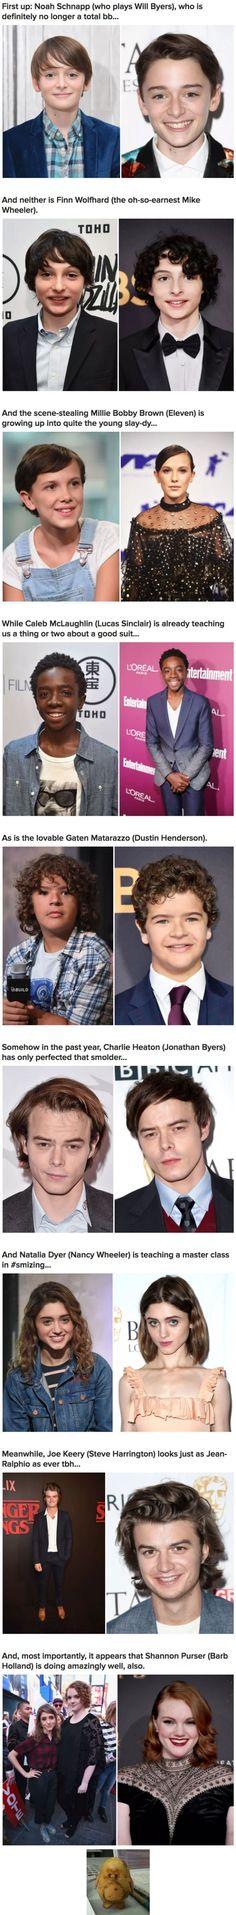 Ummm hellooooo?!? Noah and Finn are still AMAZING❤️